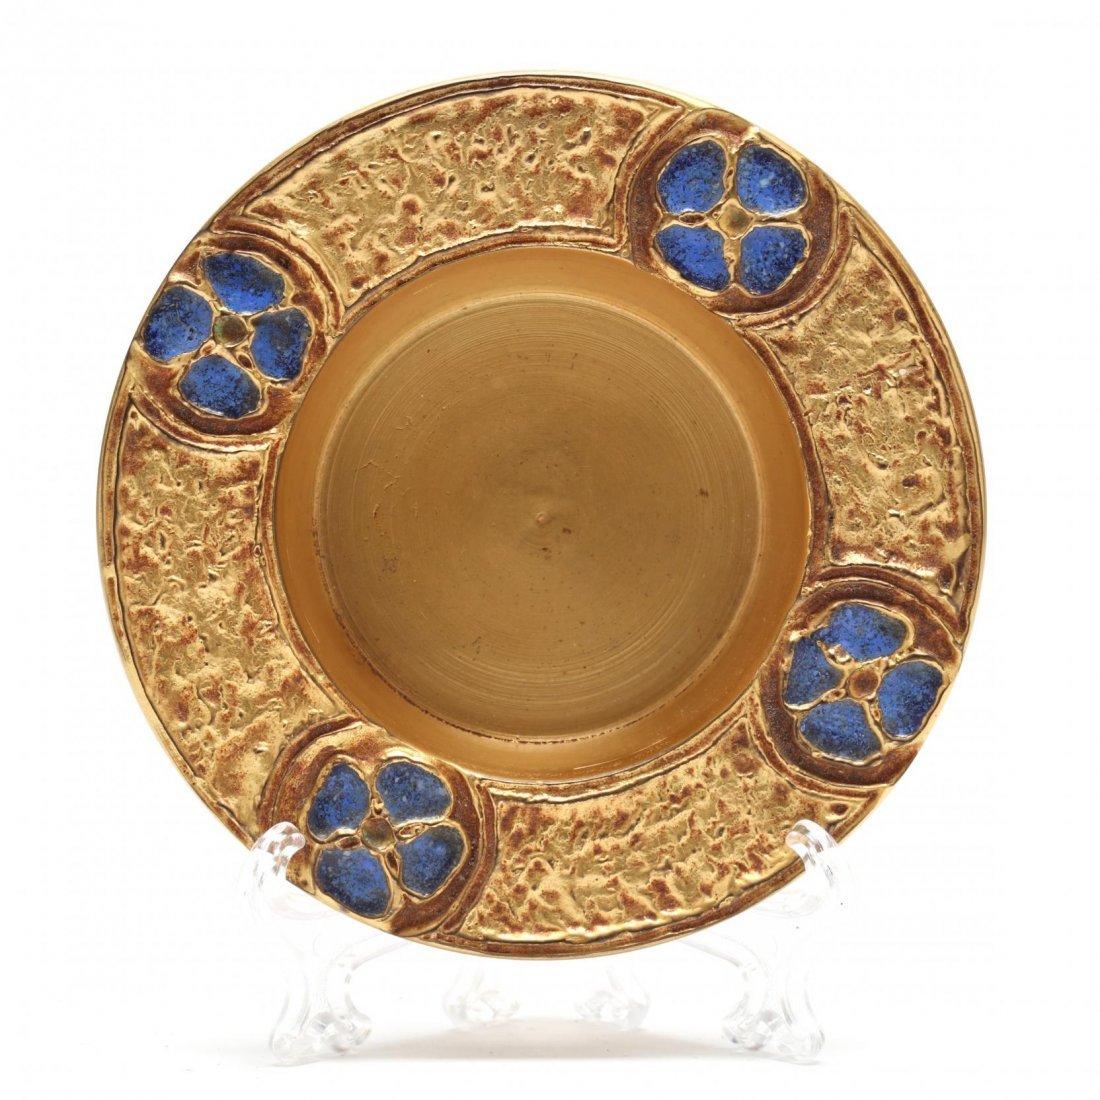 Tiffany Furnaces, Enameled and Gilt Bronze Dish